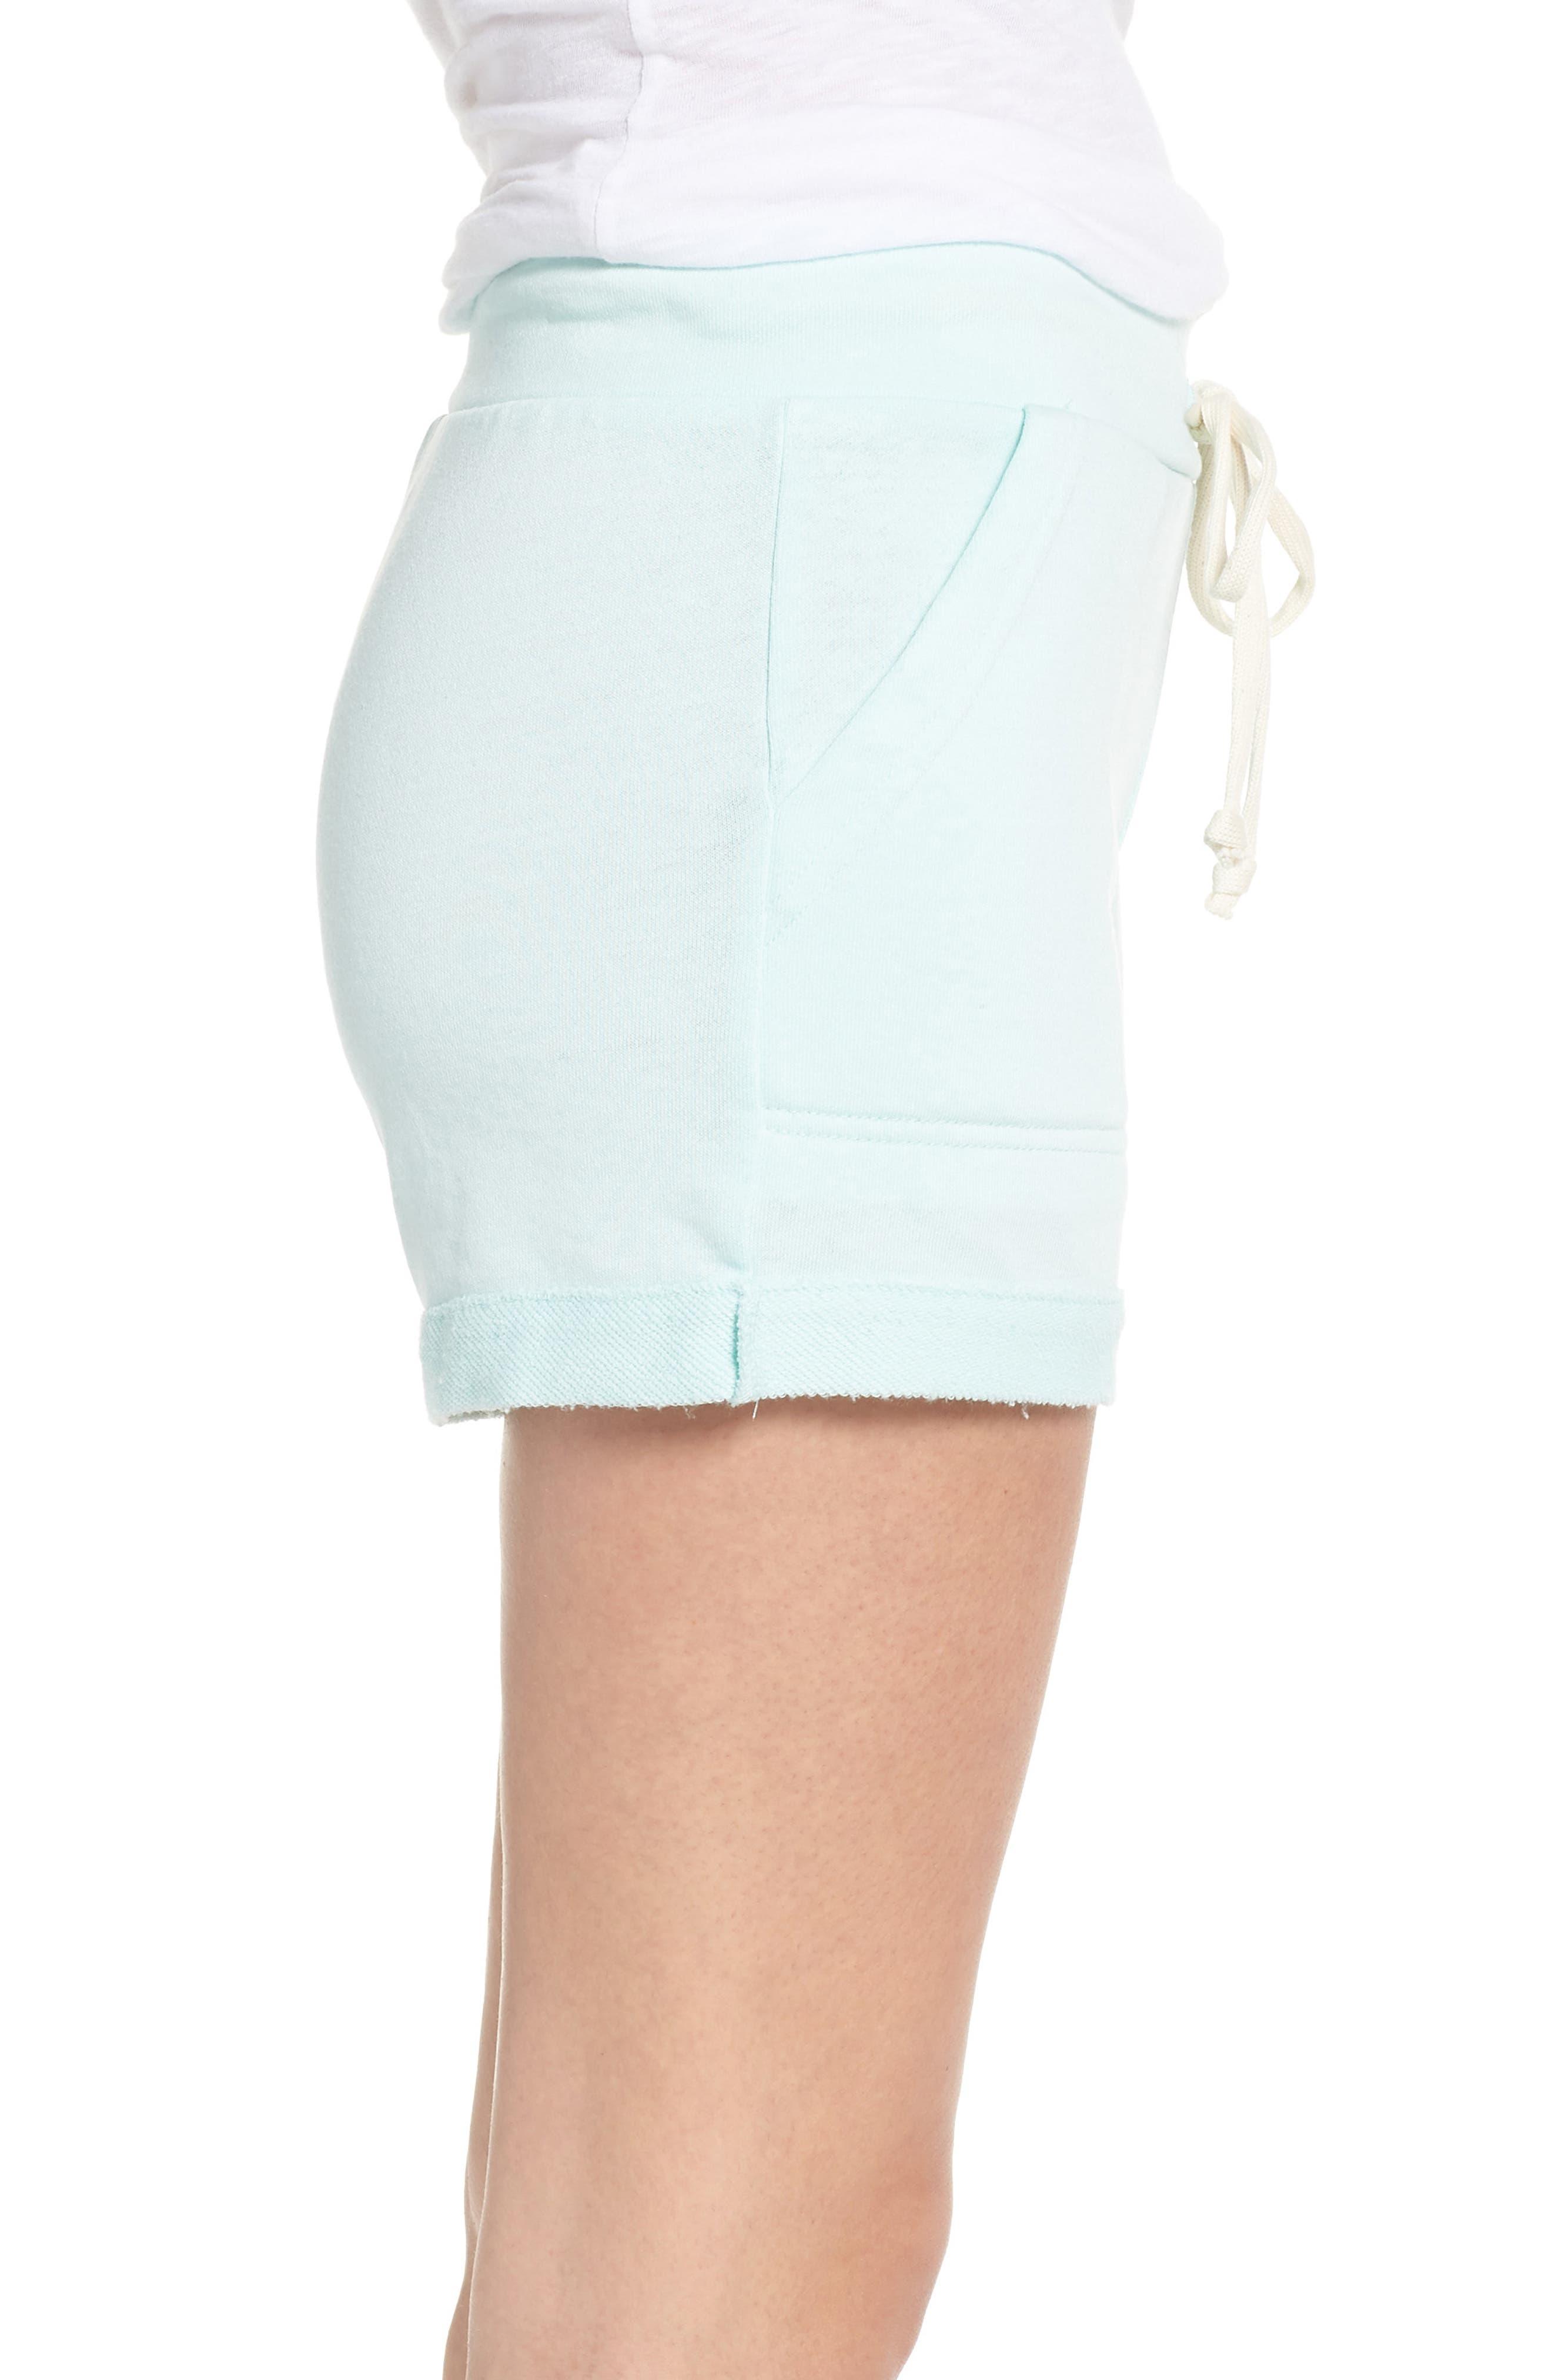 Lounge Shorts,                             Alternate thumbnail 3, color,                             300